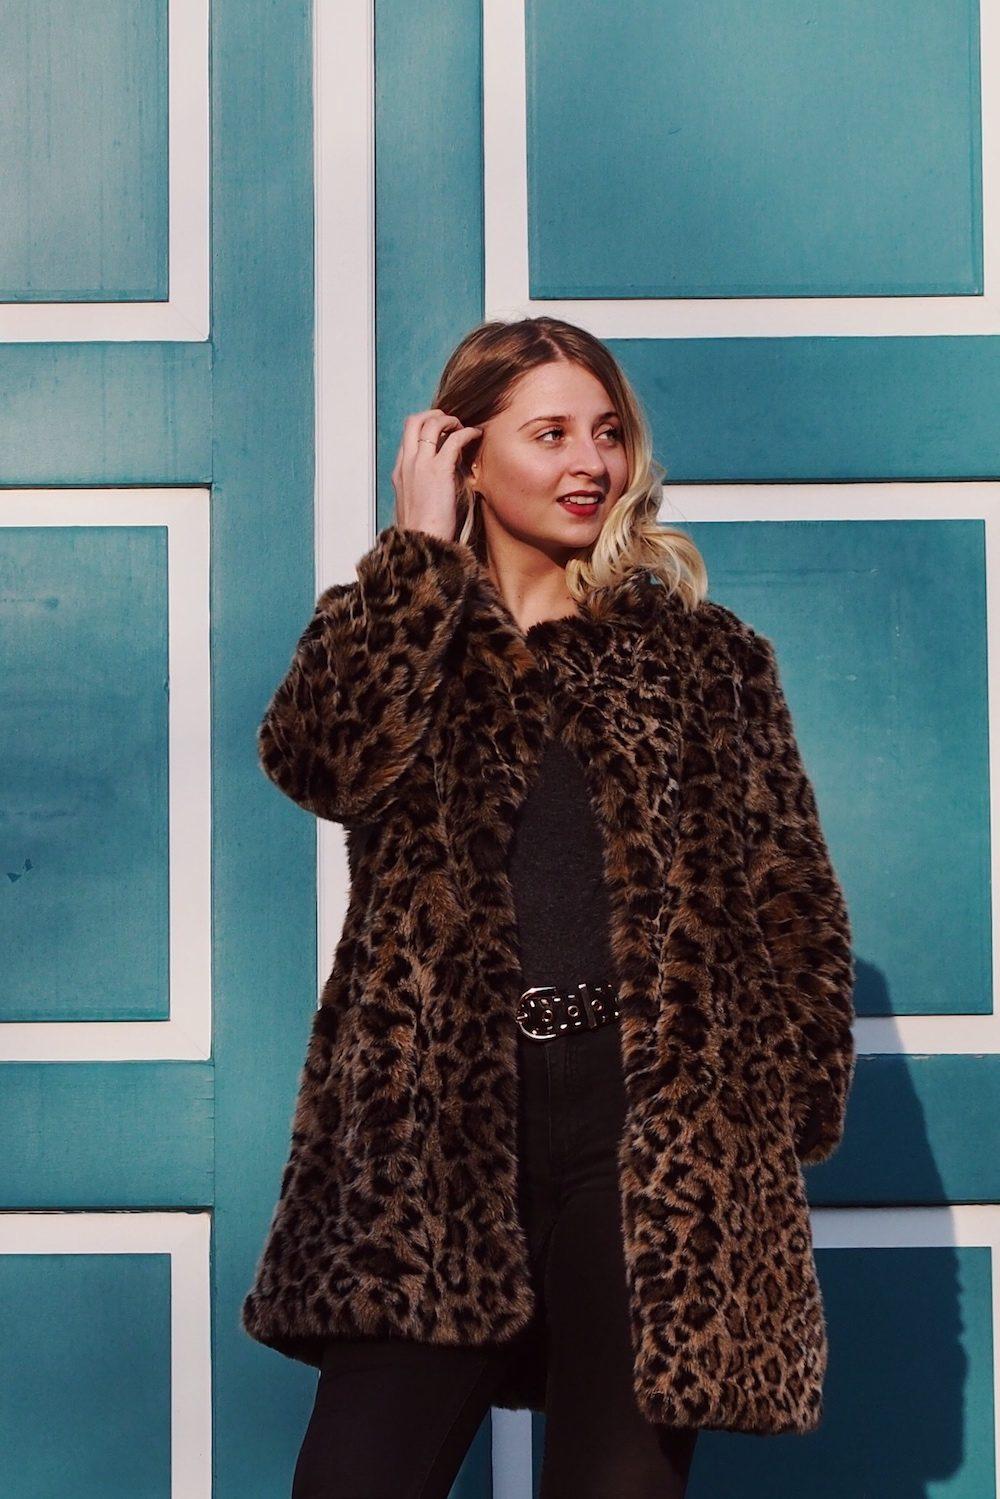 Lisa Schnatz, Modeblog, Fashionblog, Leopardenmantel, Bielefeld